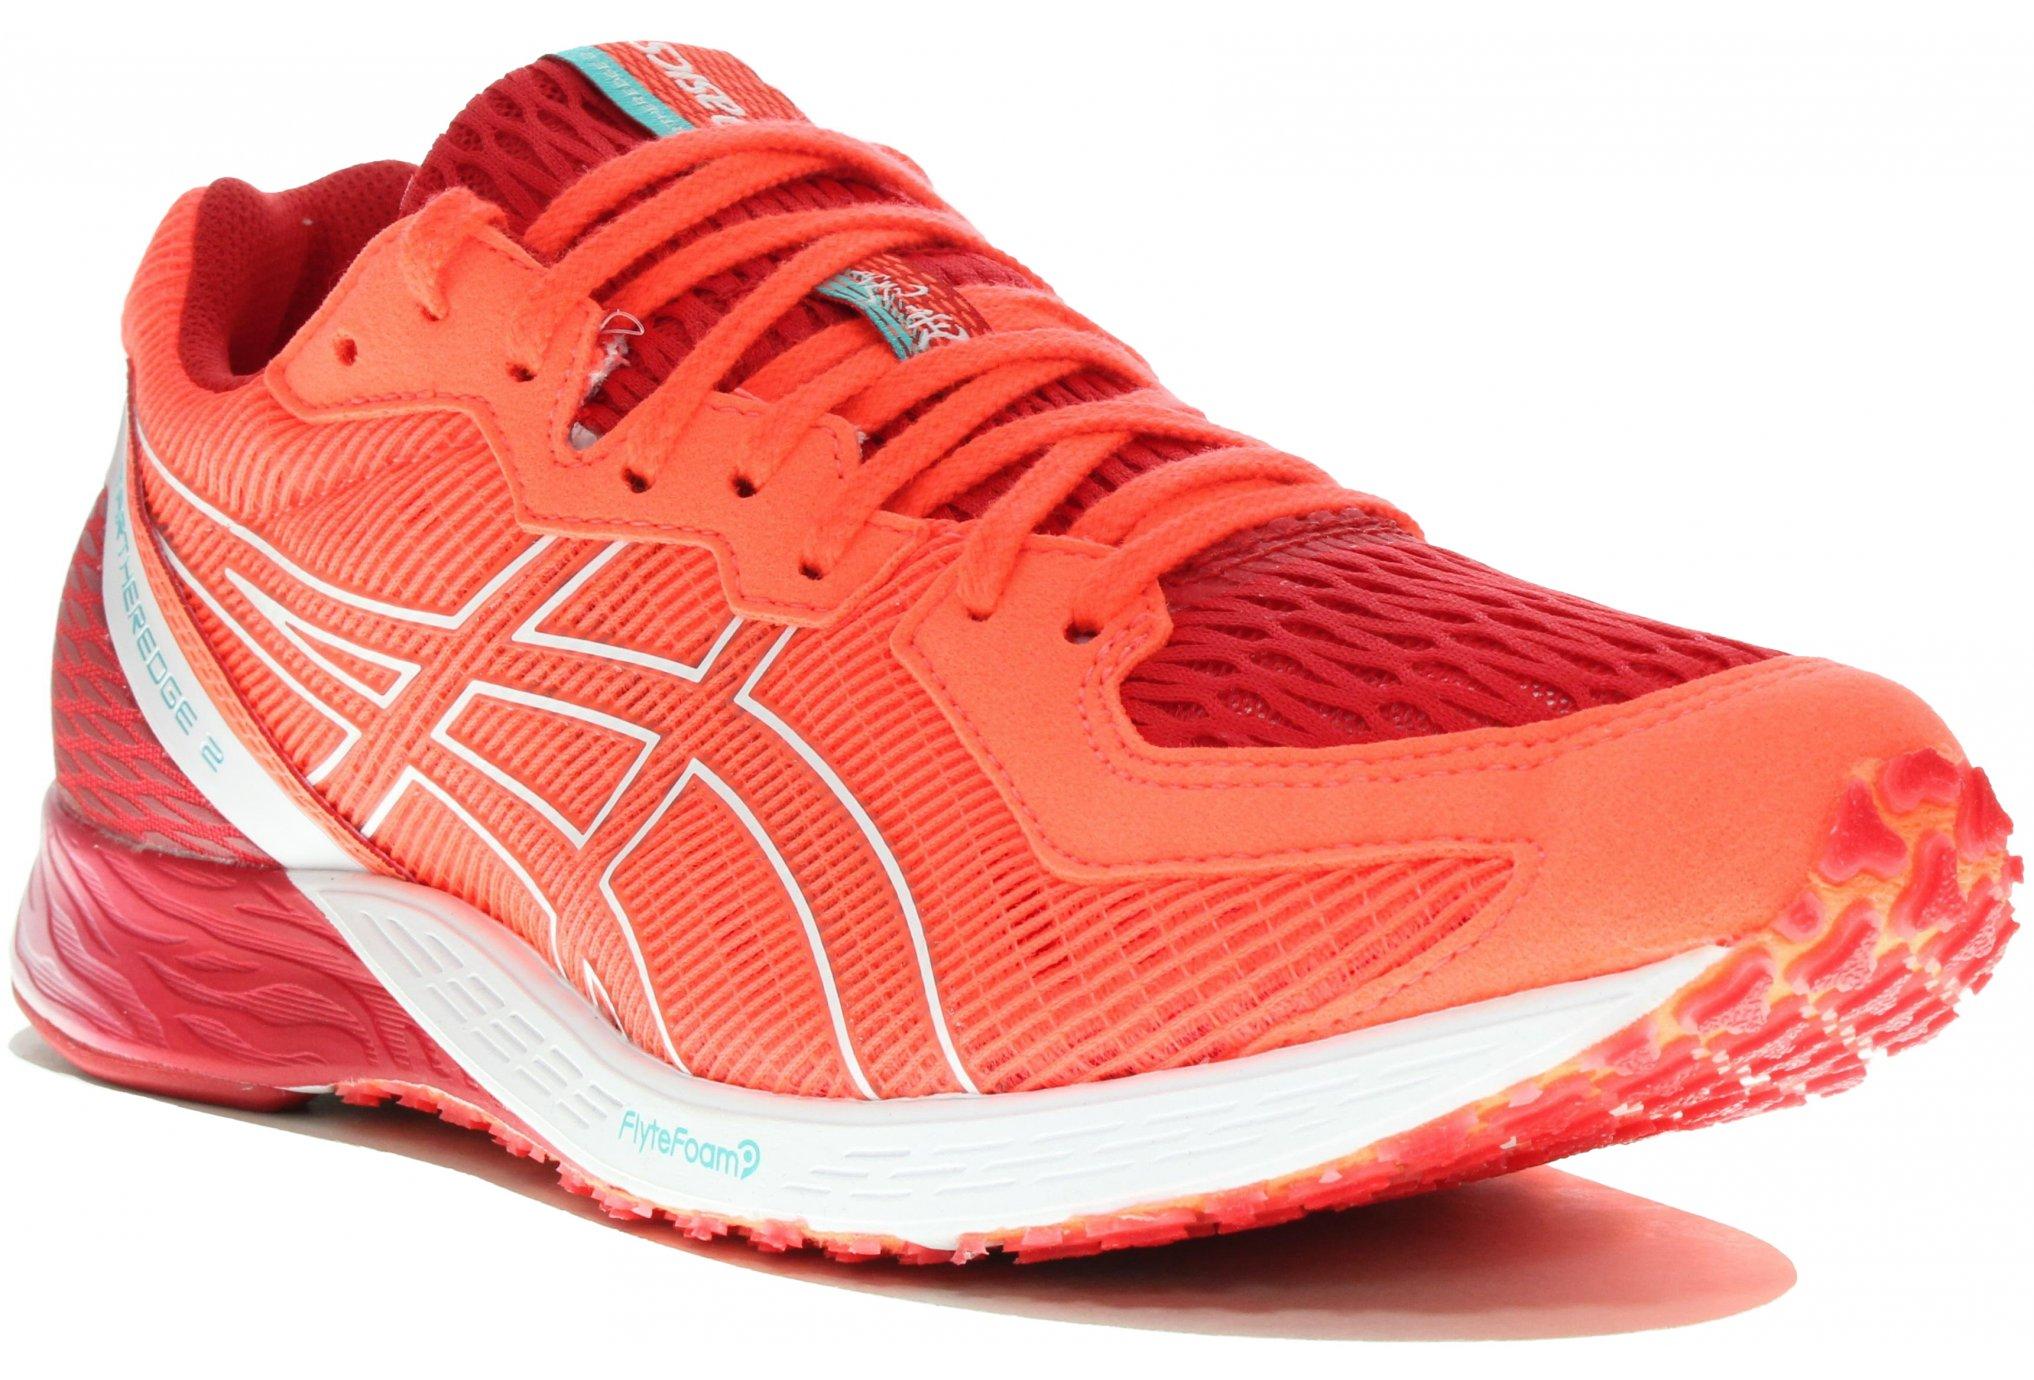 Asics Tartheredge 2 Chaussures running femme